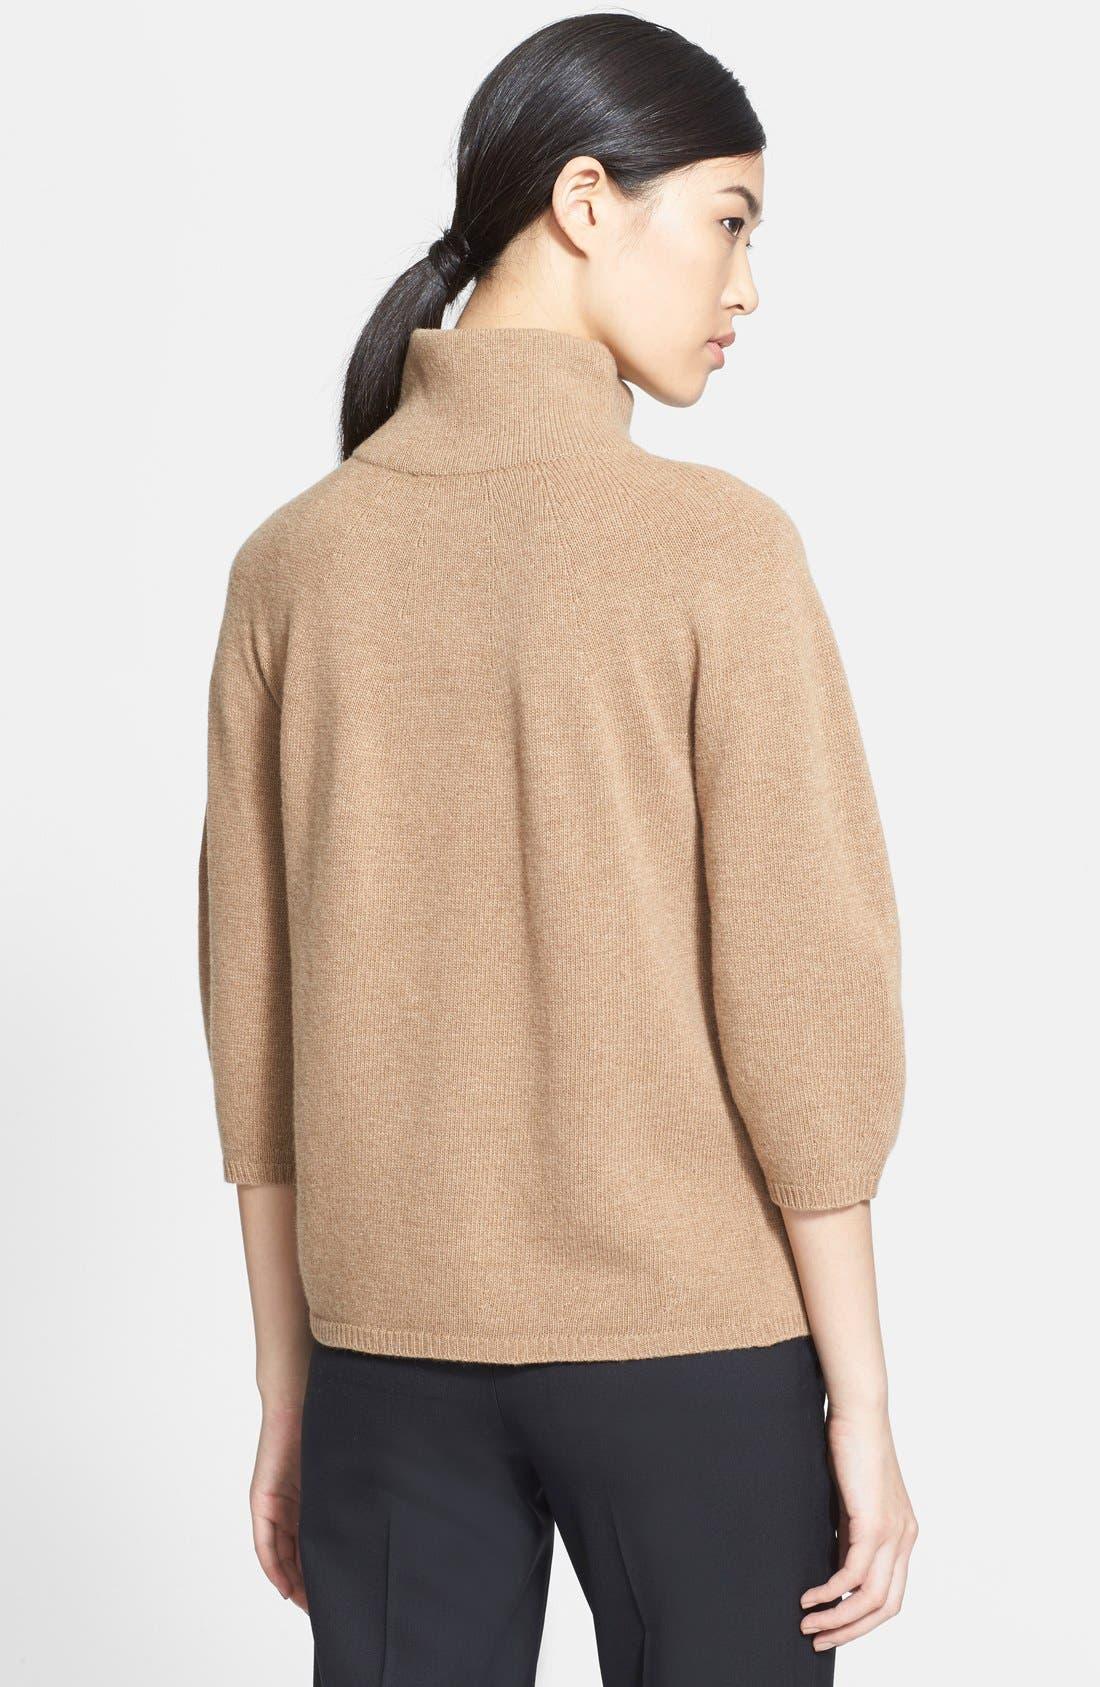 MAX MARA,                             'Anselmo' Wool & Cashmere Sweater,                             Alternate thumbnail 3, color,                             232